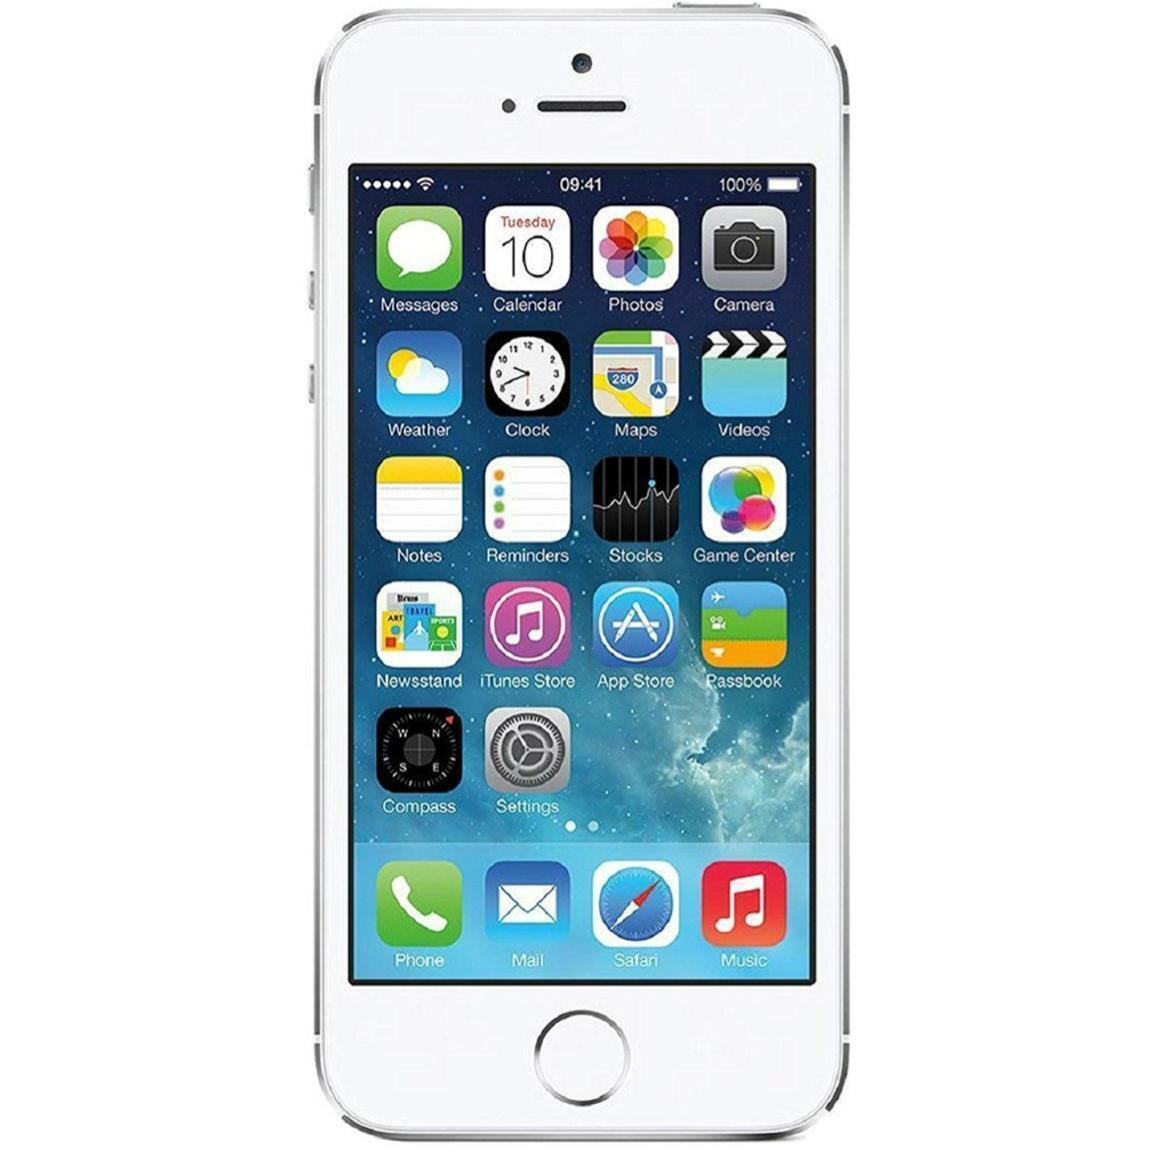 Apple iPhone 5S - Unlocked - 16GB 32GB 64GB - Gold Gray Silver - Smartphone